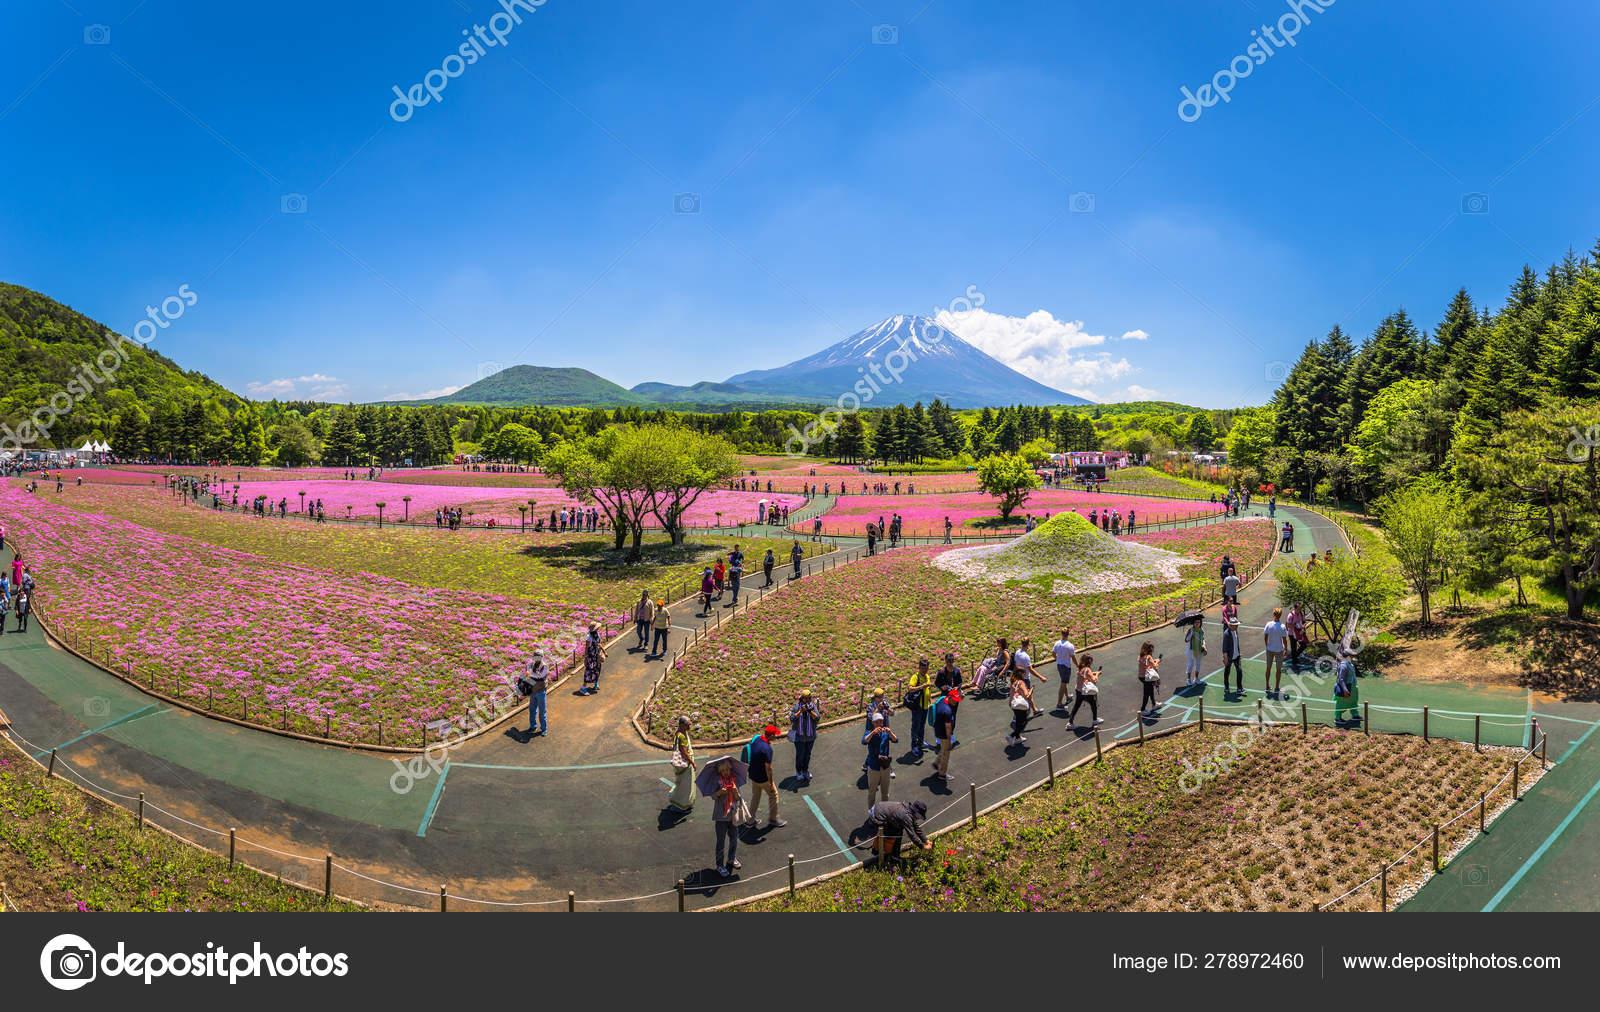 Motosu - May 24, 2019: Mount Fuji seen from the Shiba-Sakura